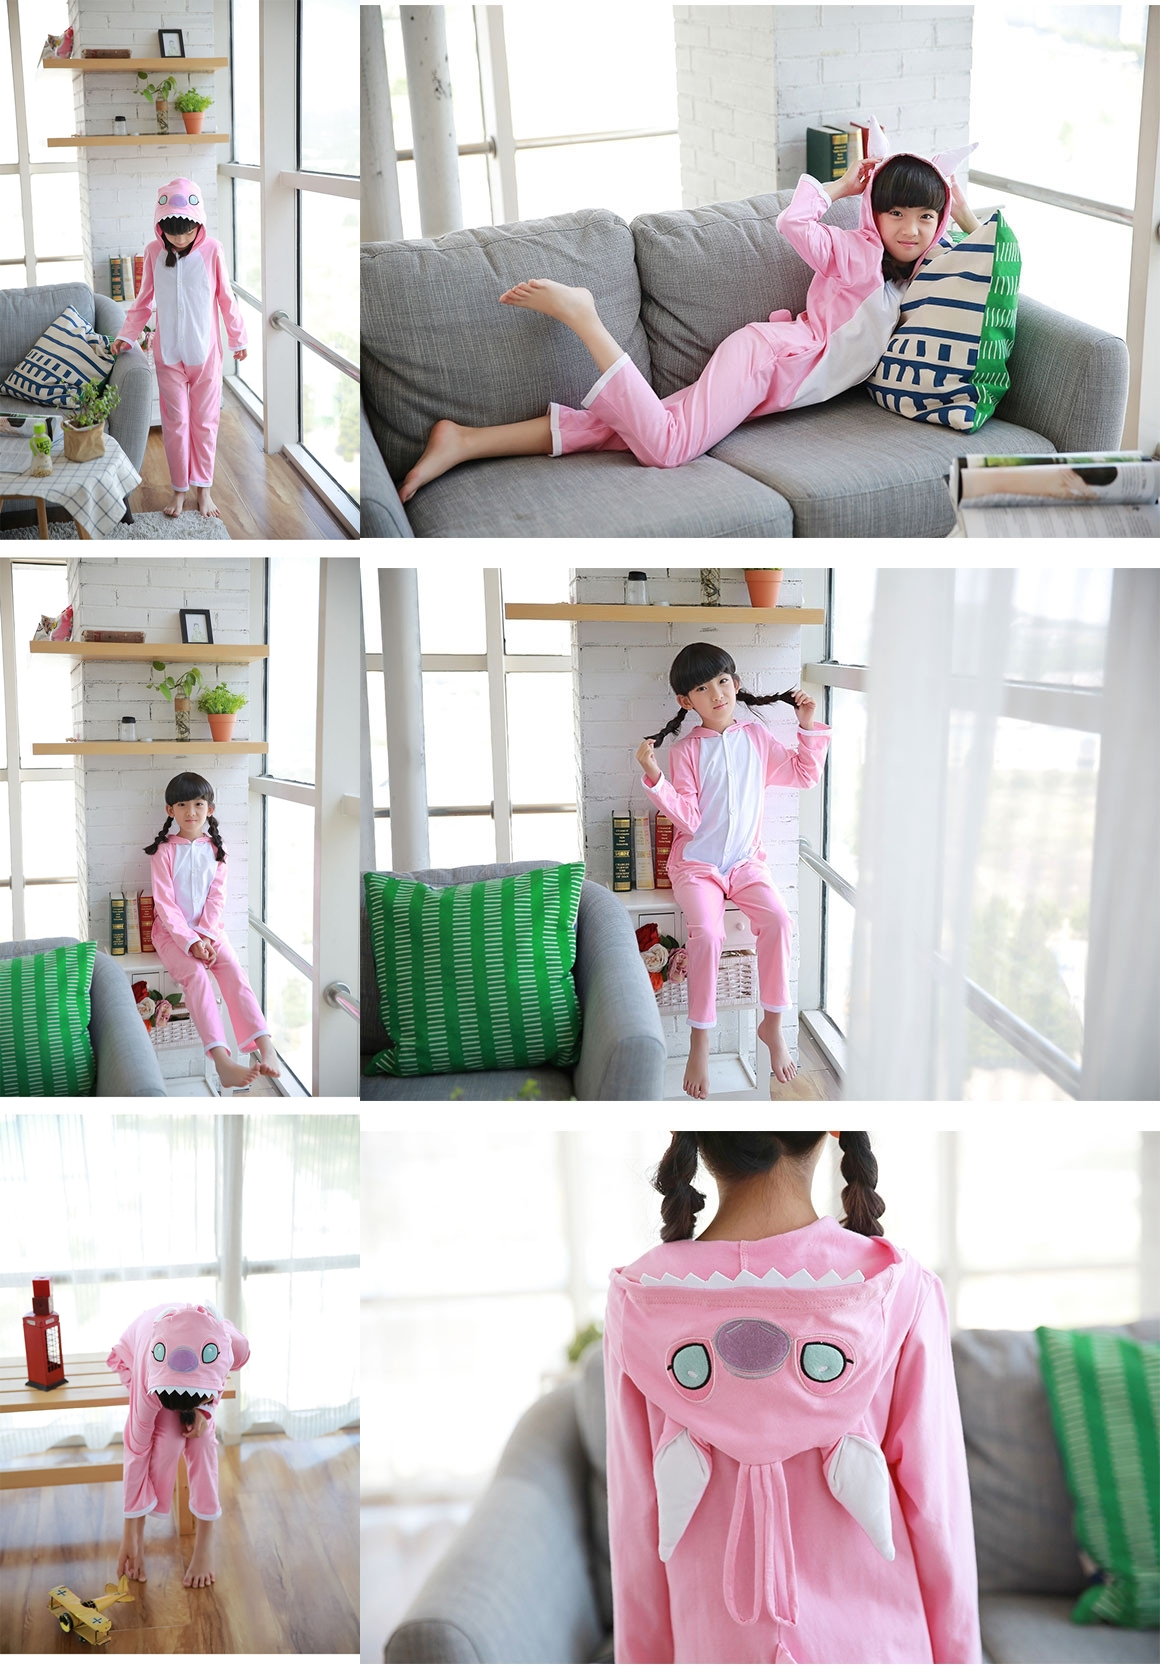 Pijama Completo de Pink Stitch para niñas